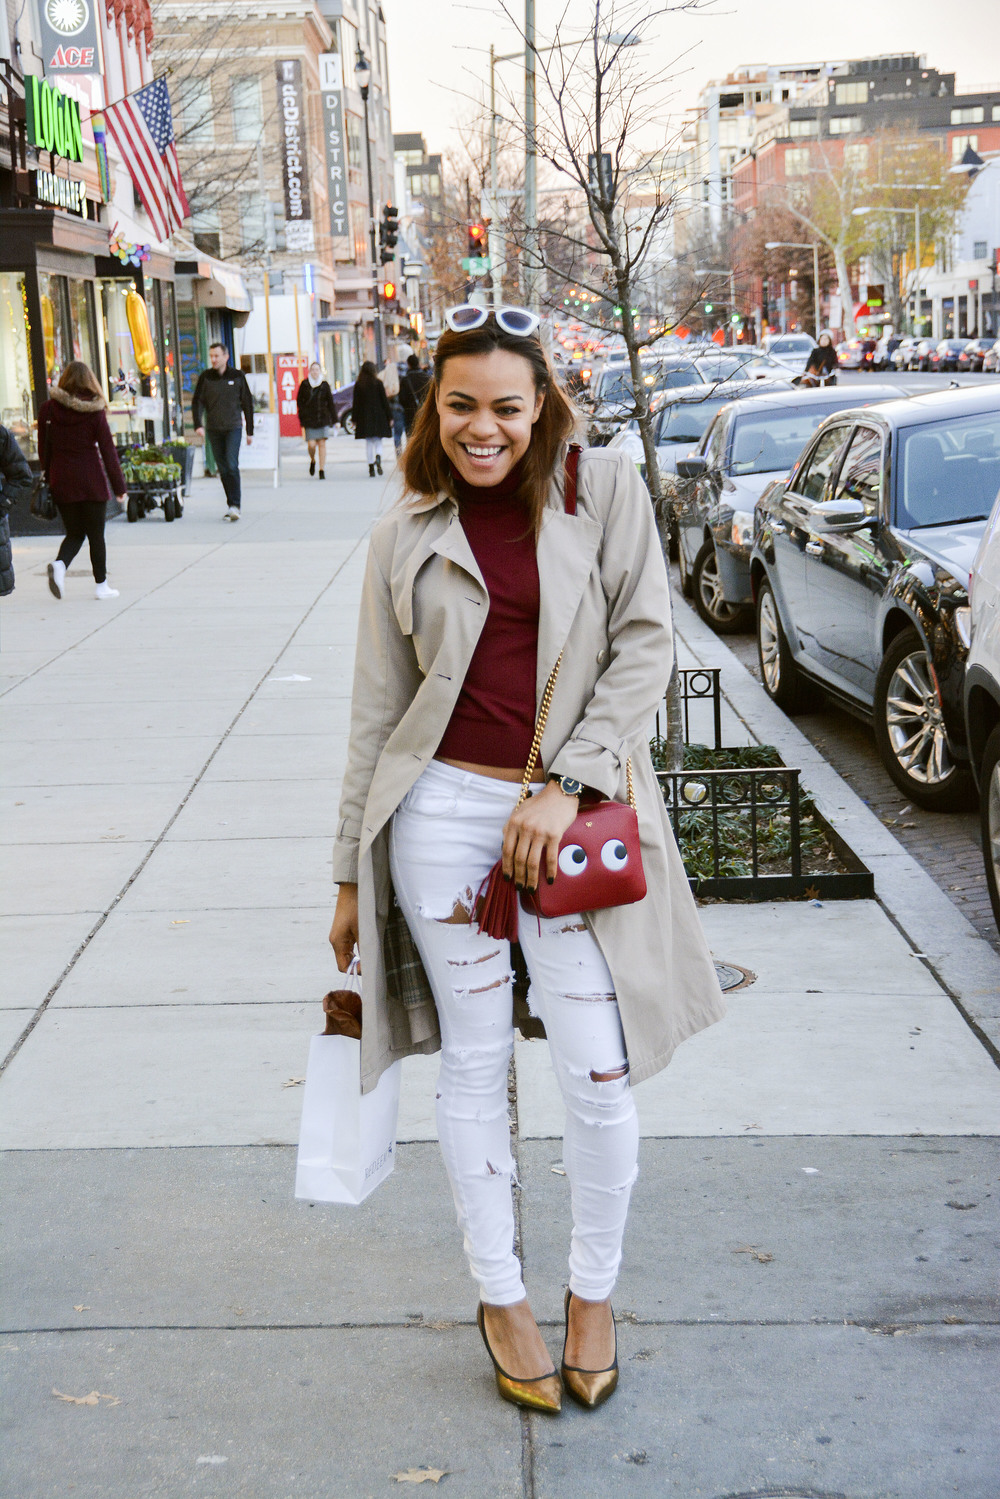 wearing: ZARA jeans, Giuseppe Zanotti shoes, ZARA turtleneck,Anya Hindmarch crossbody bag, Gucci watch, Prada sunnies, shopping bag from Redeem.